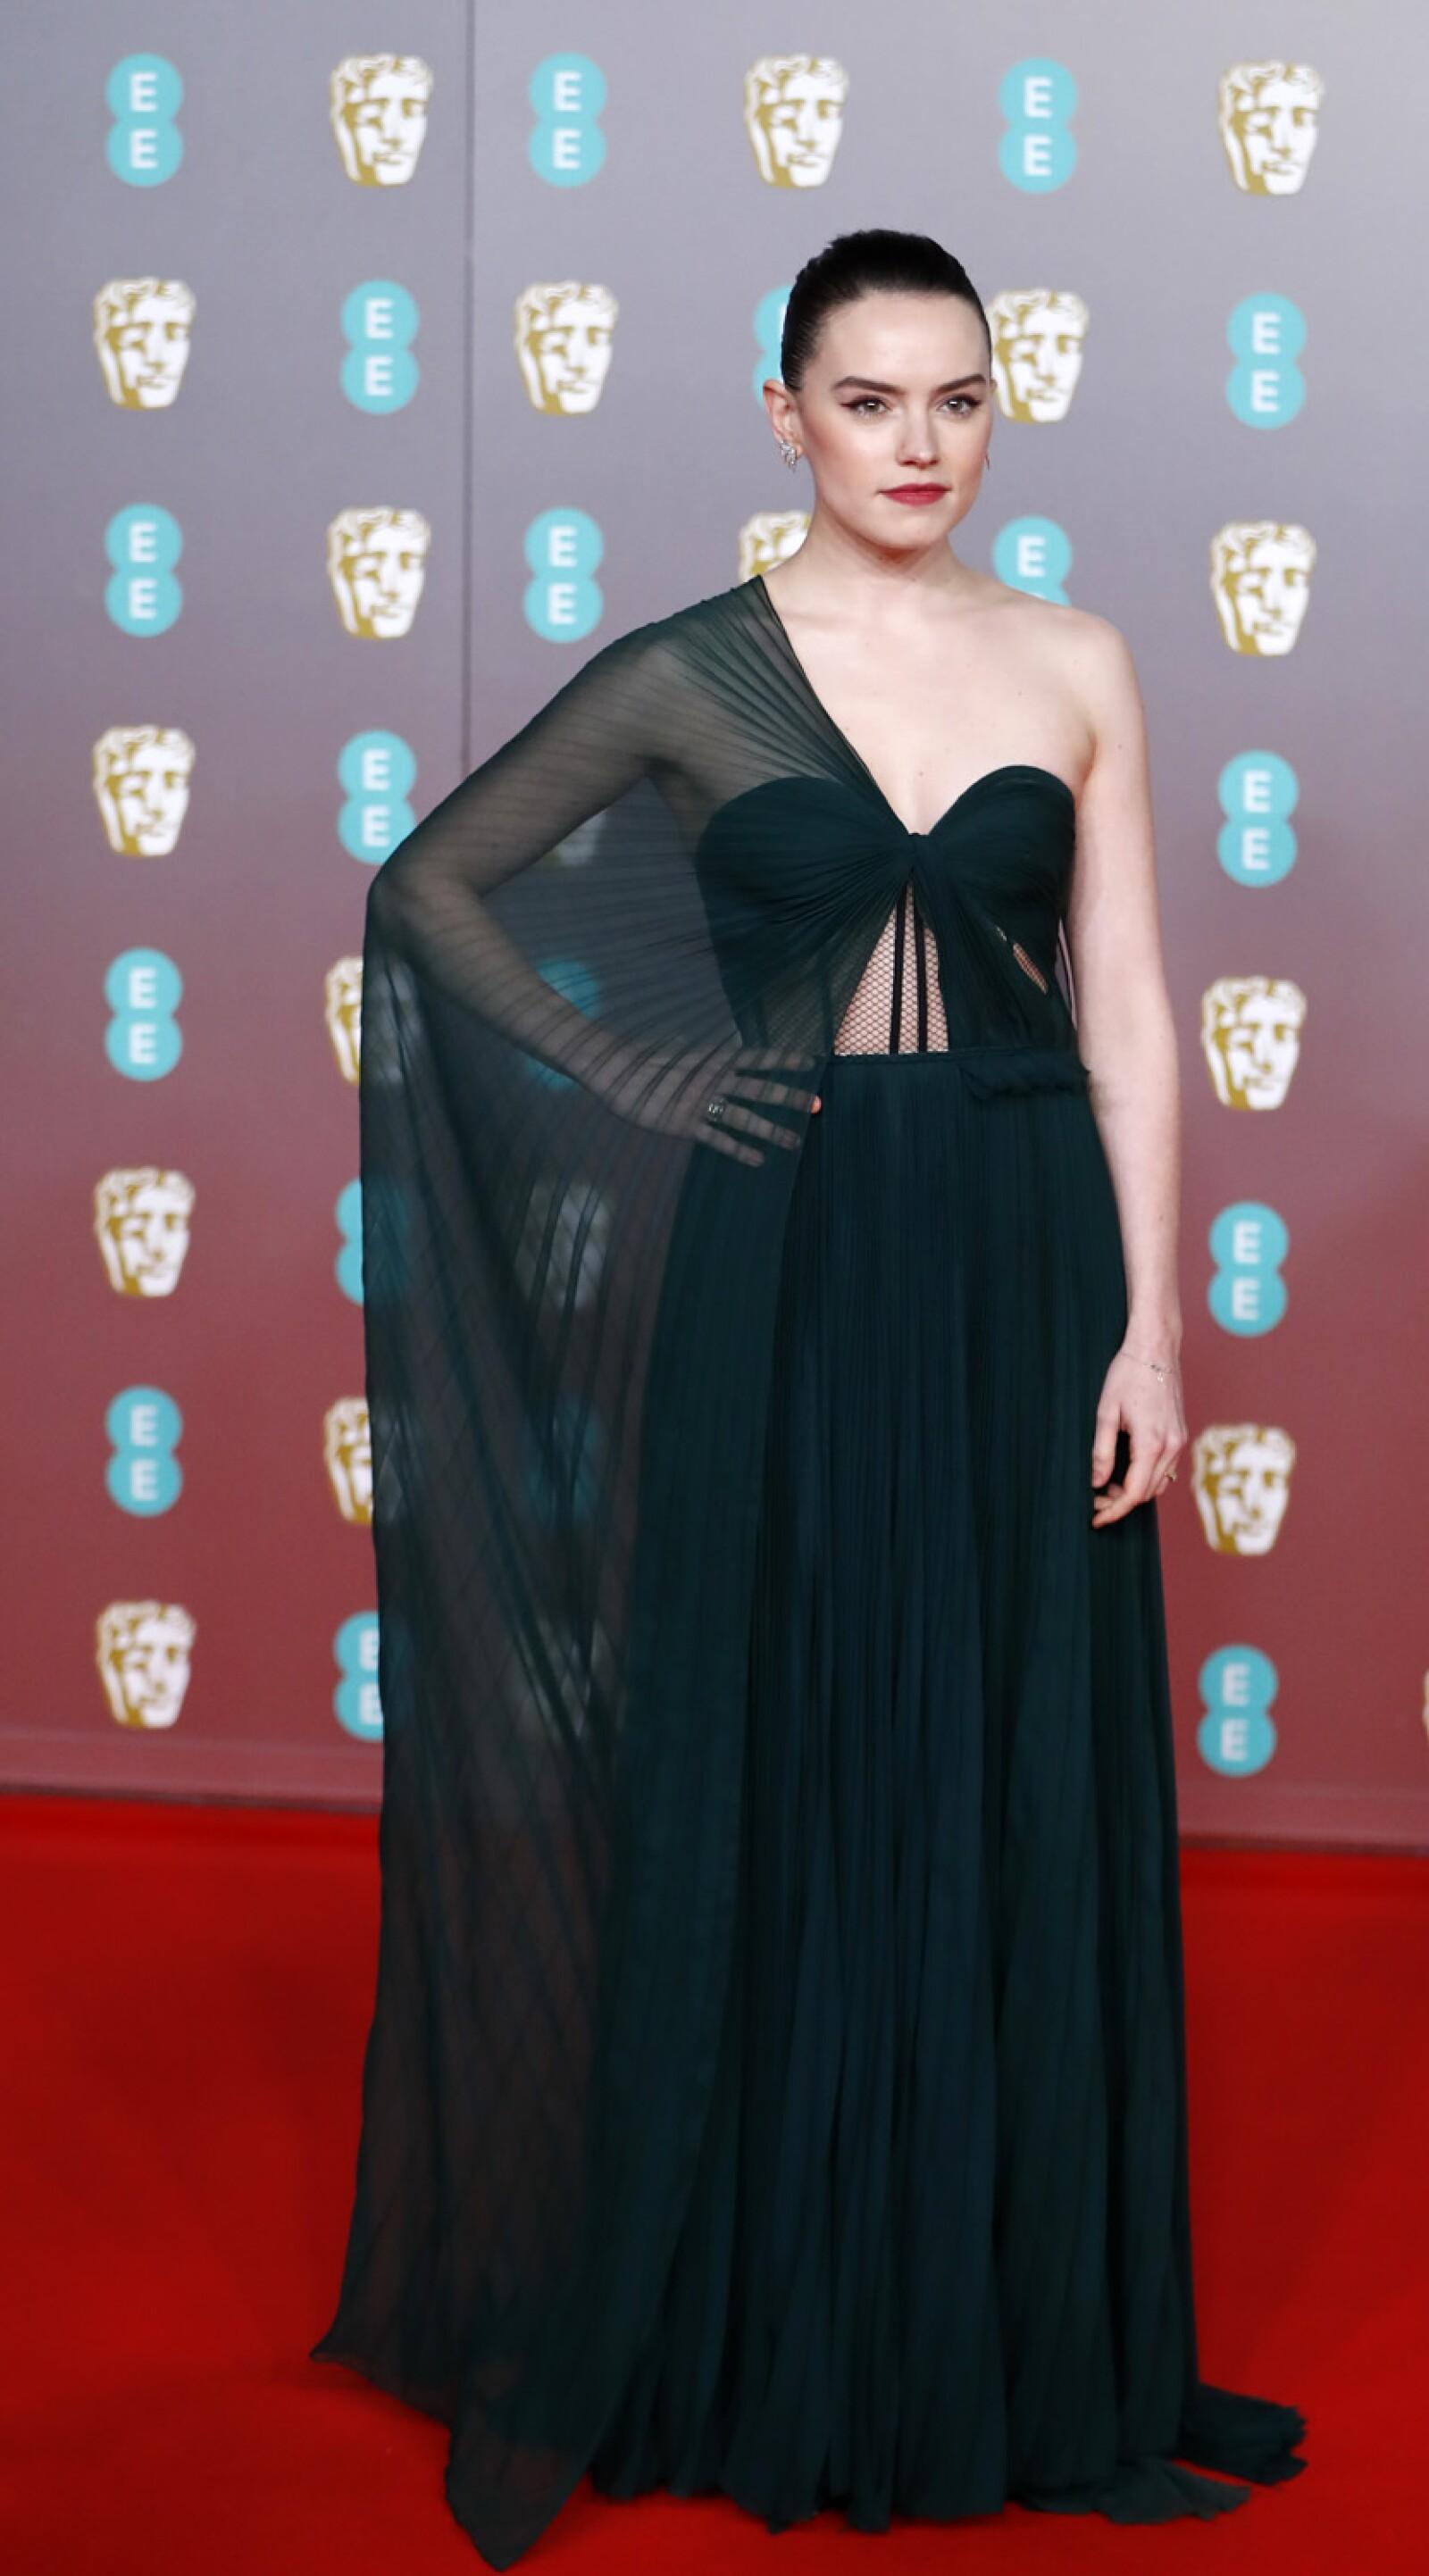 BRITAIN-ENTERTAINMENT-FILM-AWARDS-BAFTA